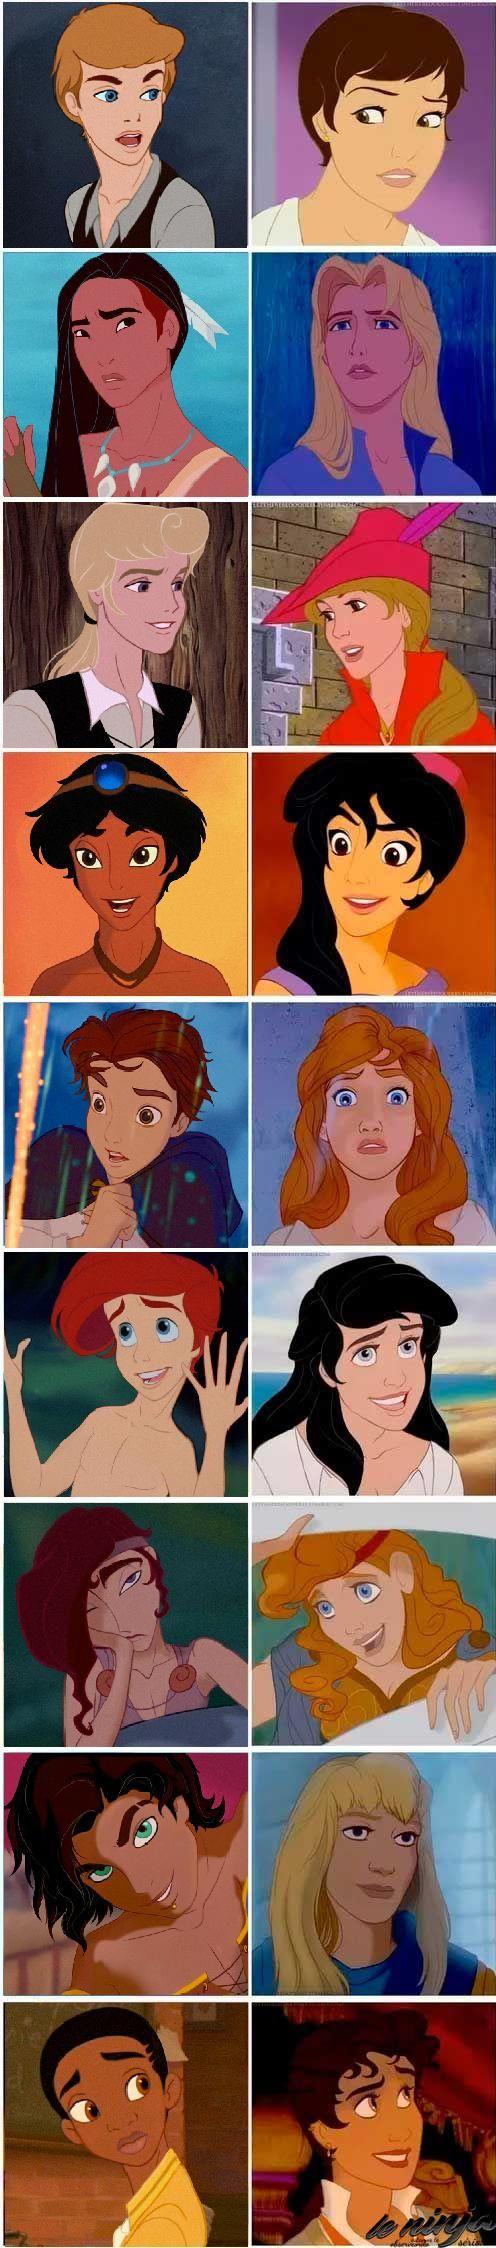 Disney Prince/Princess genderbend. and hercules looks really good as a girl that is creepy